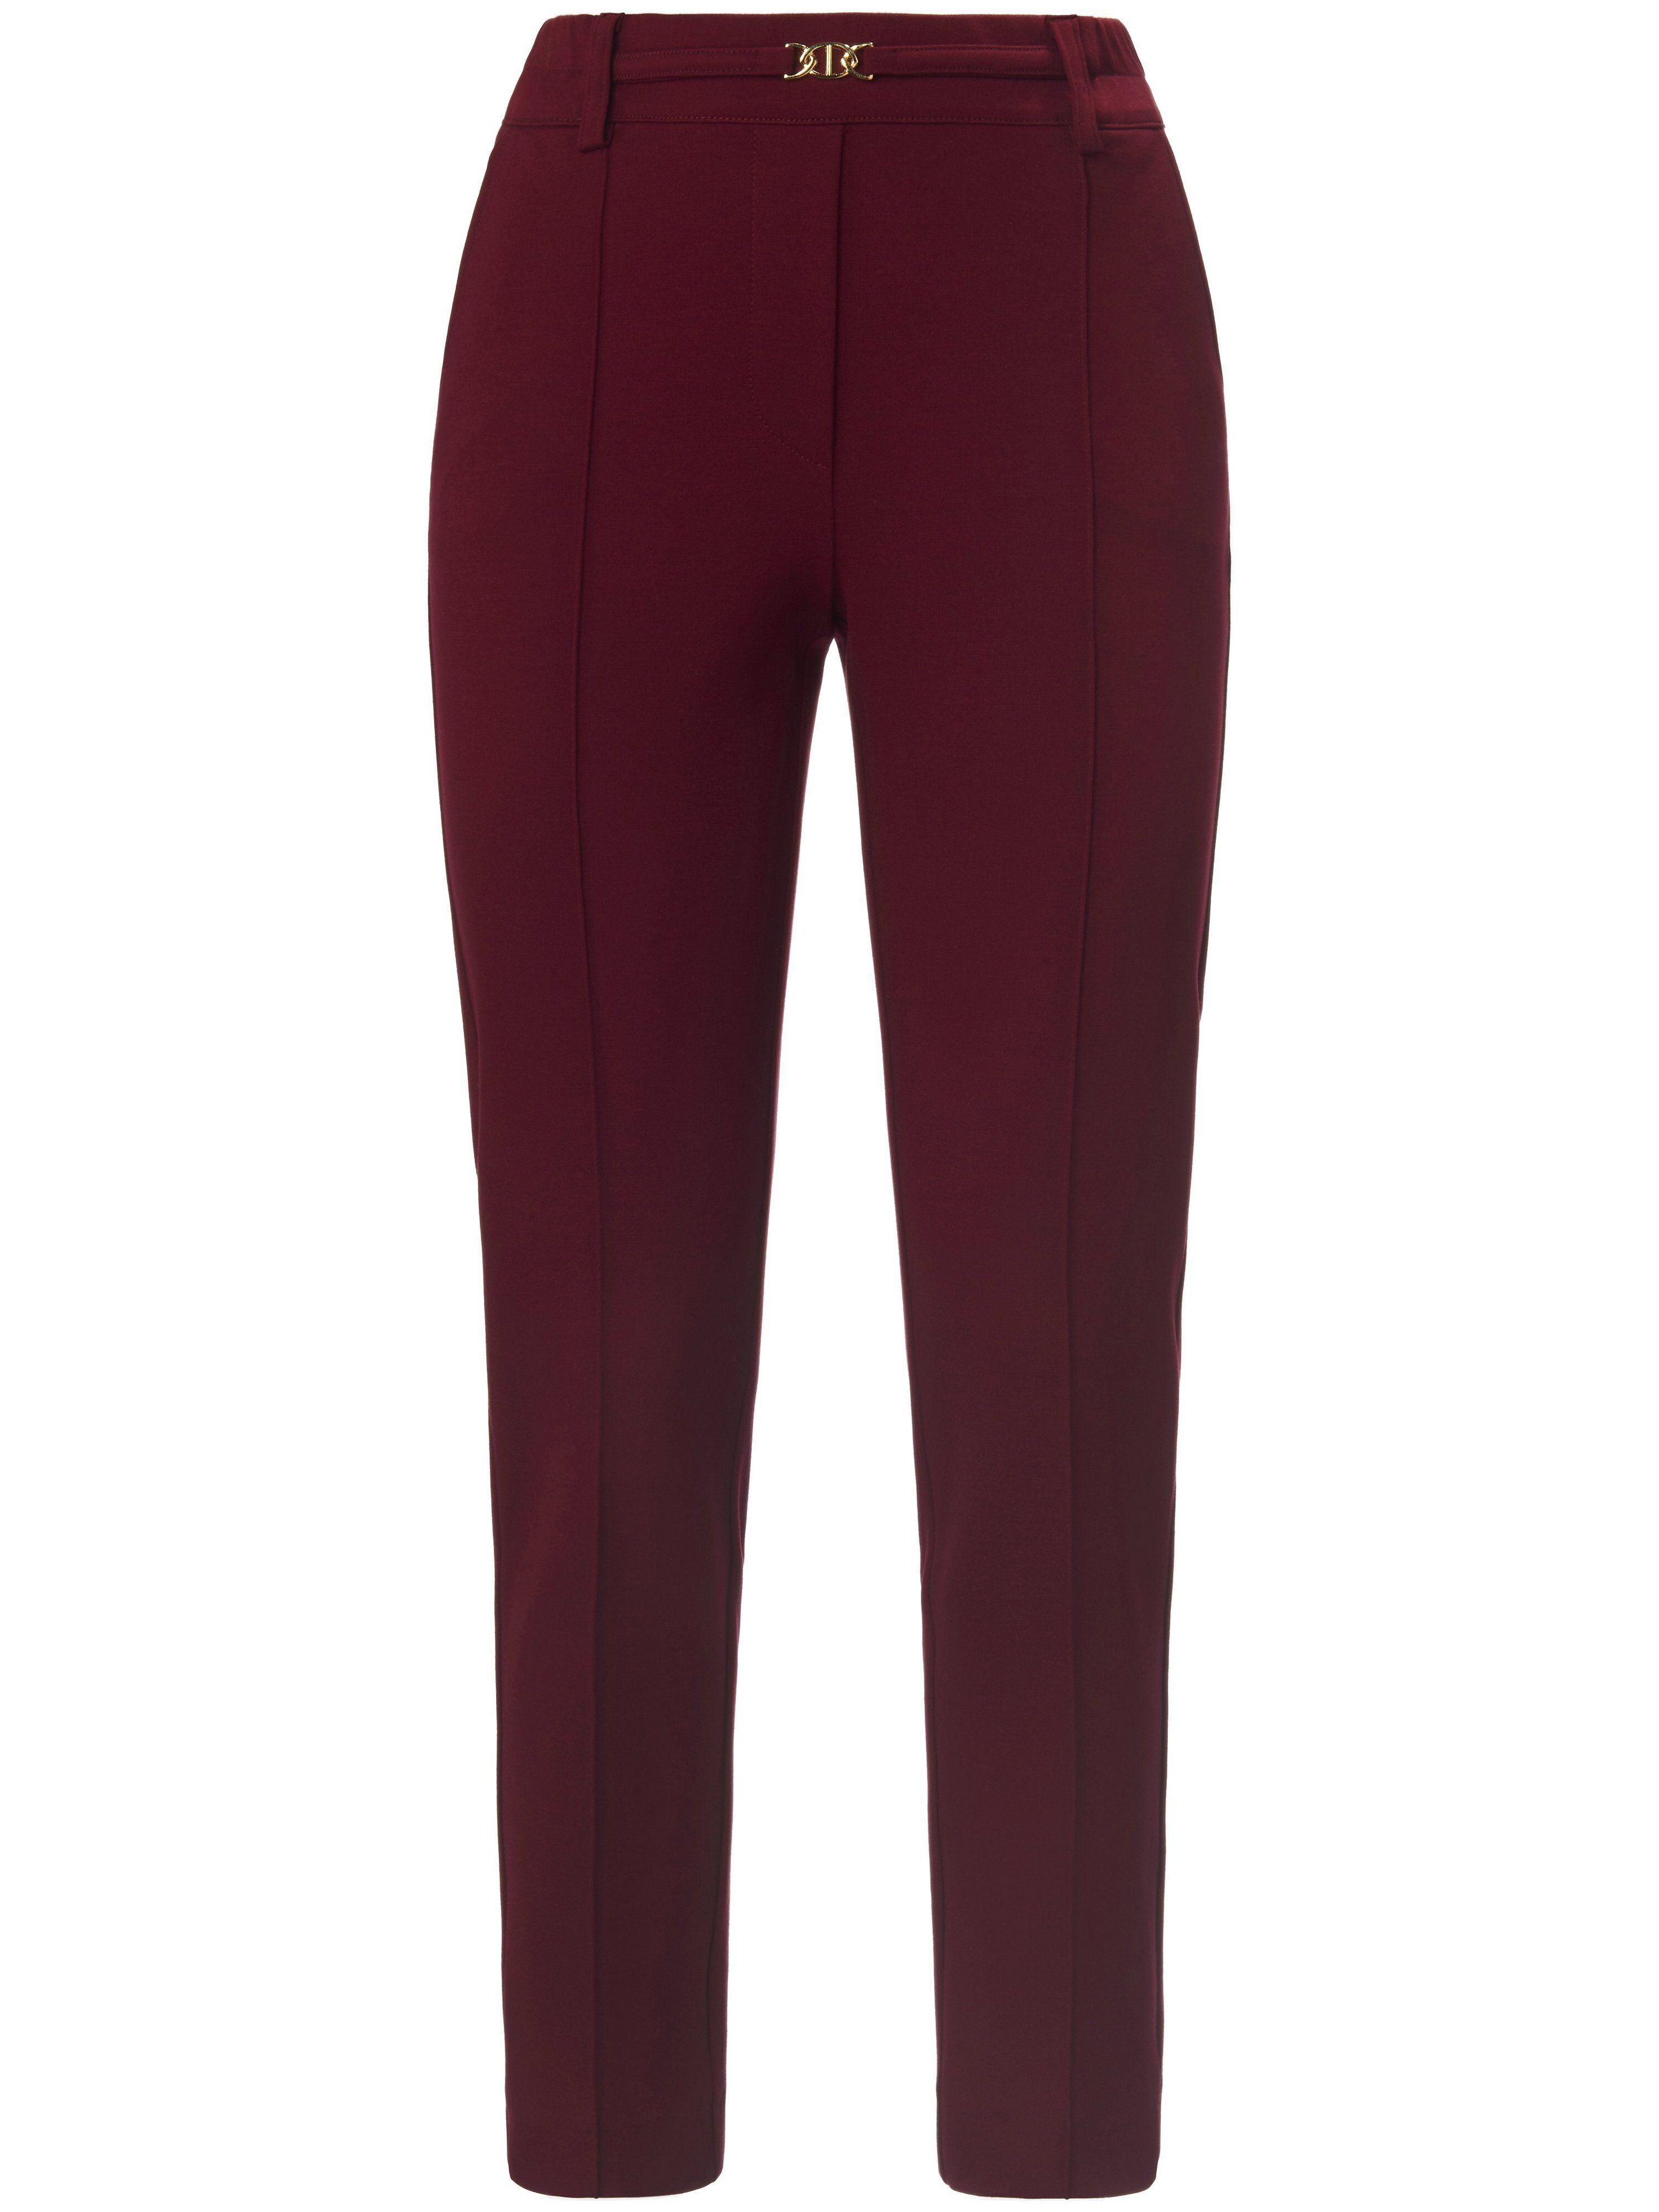 Uta Raasch Le pantalon 7/8 ligne slim  Uta Raasch rouge  - Femme - 20